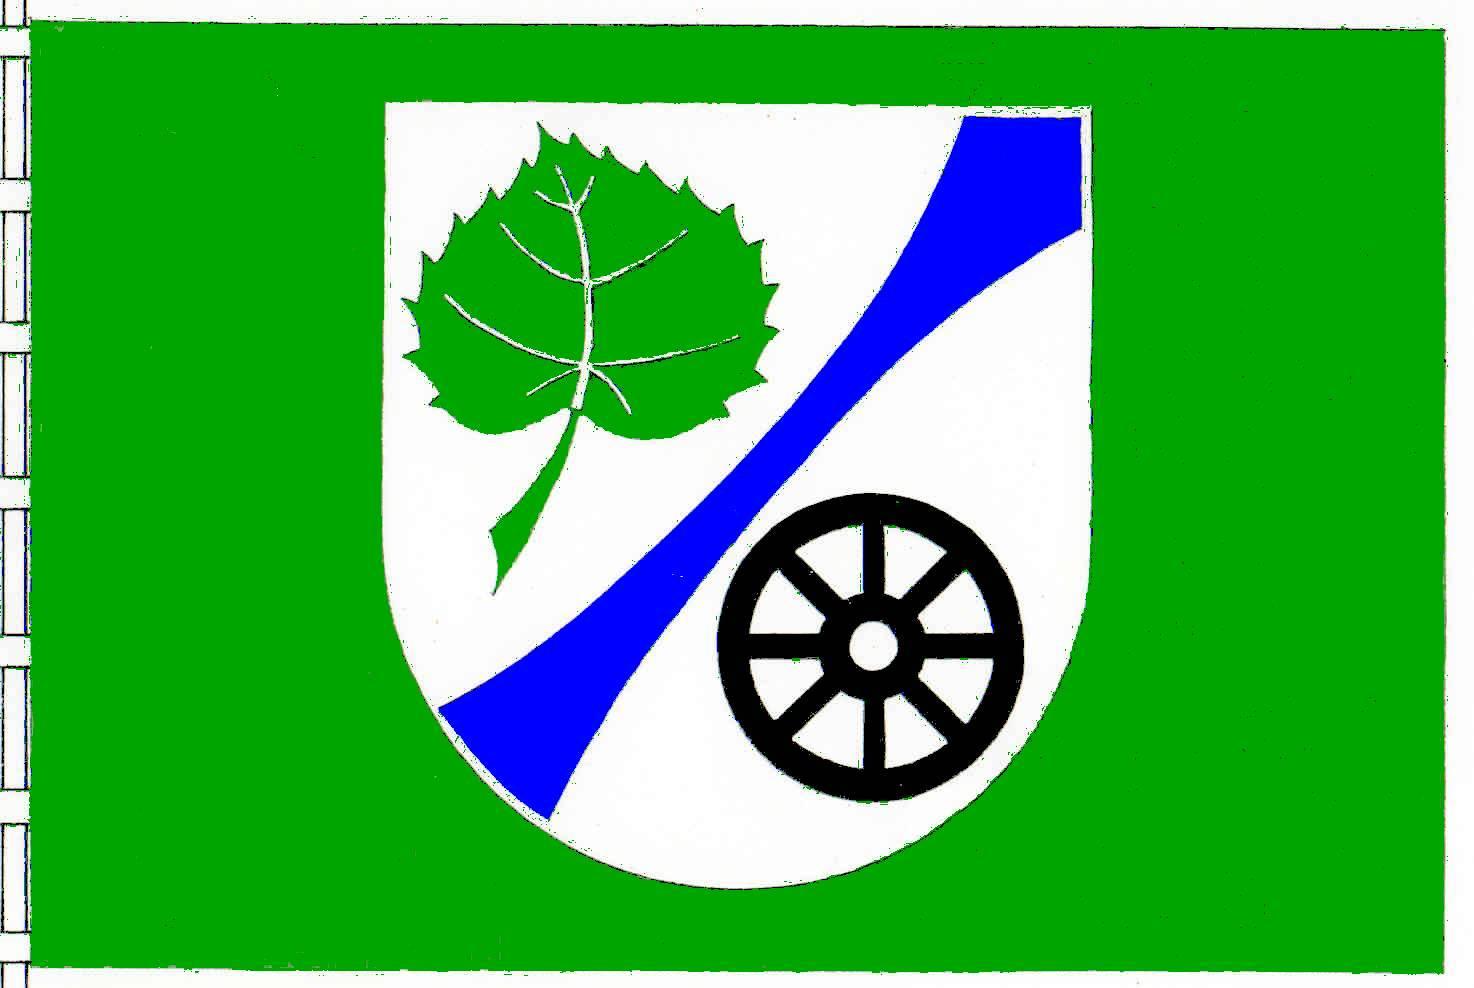 Flagge GemeindeSchackendorf, Kreis Segeberg